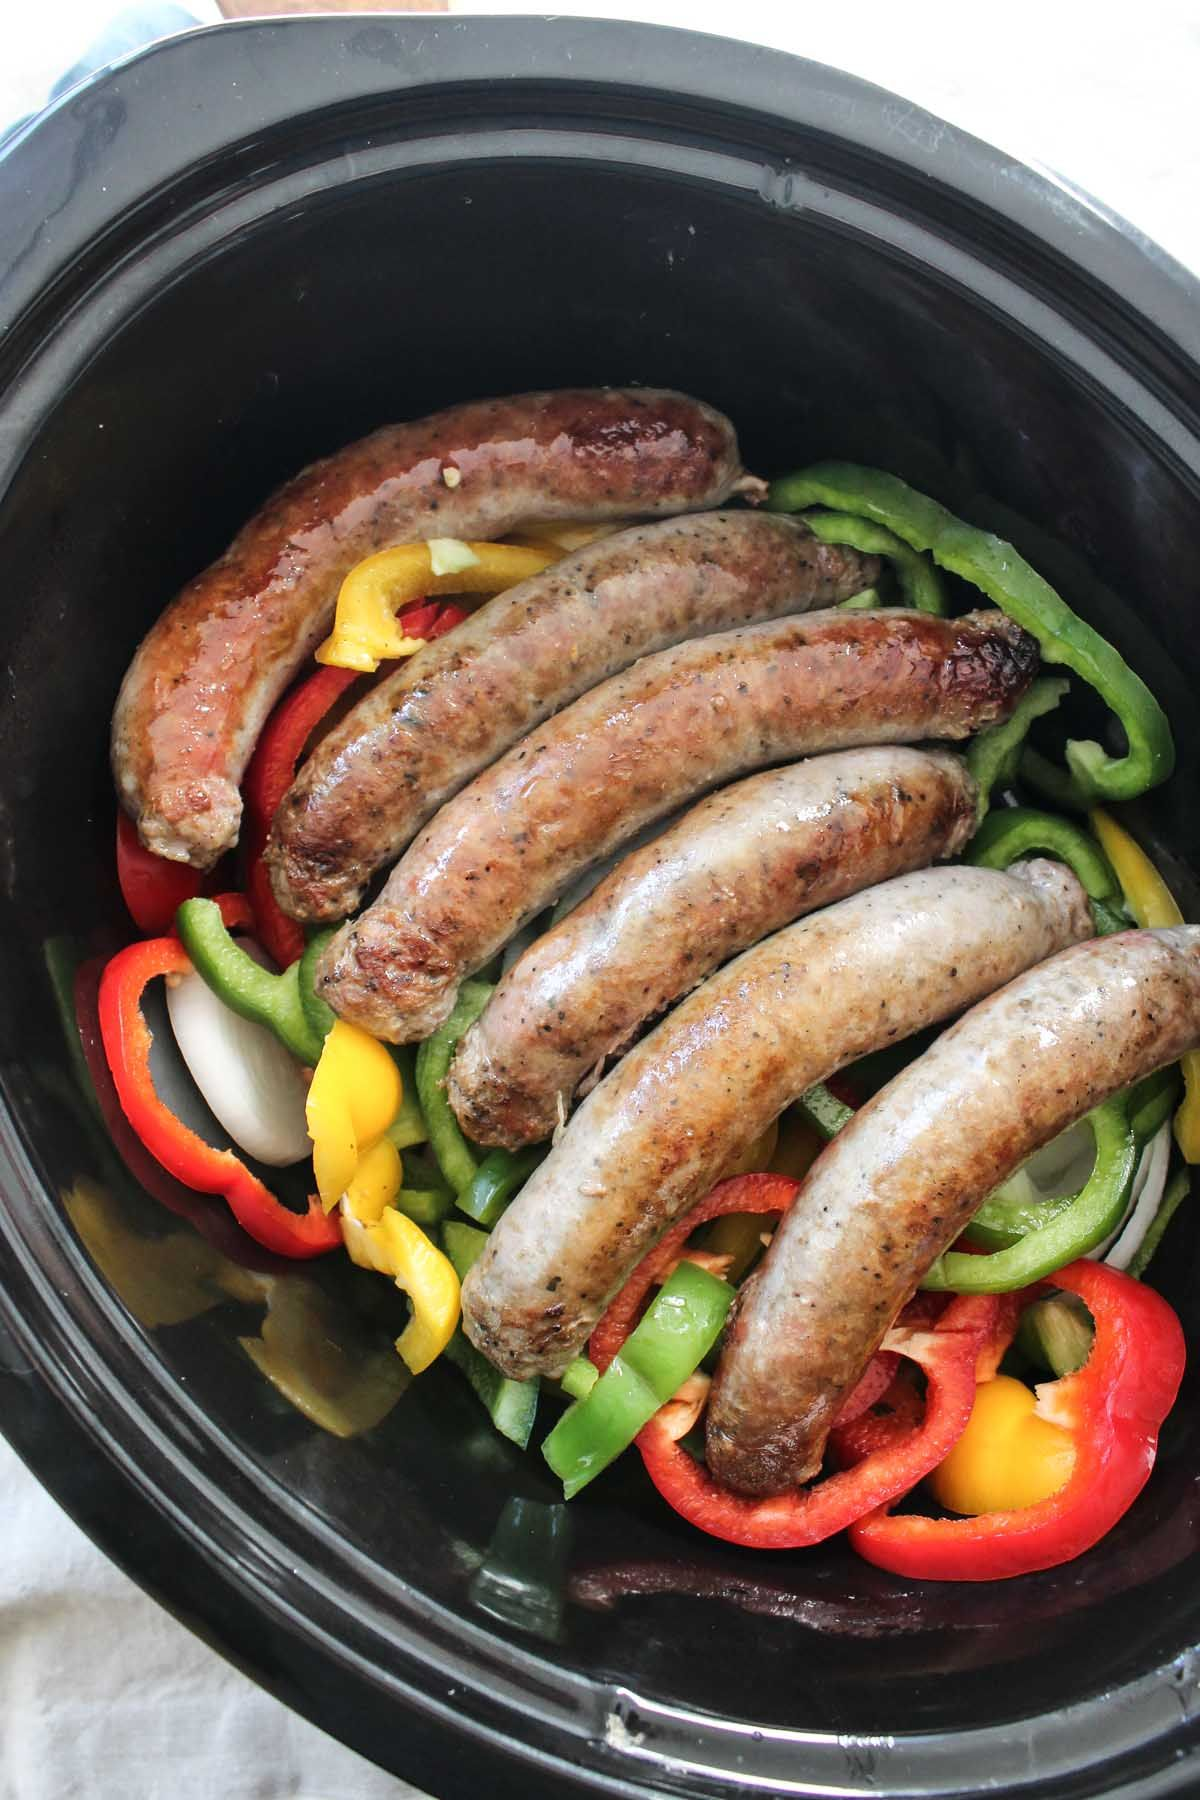 Low Carb Crockpot Recipes Beef